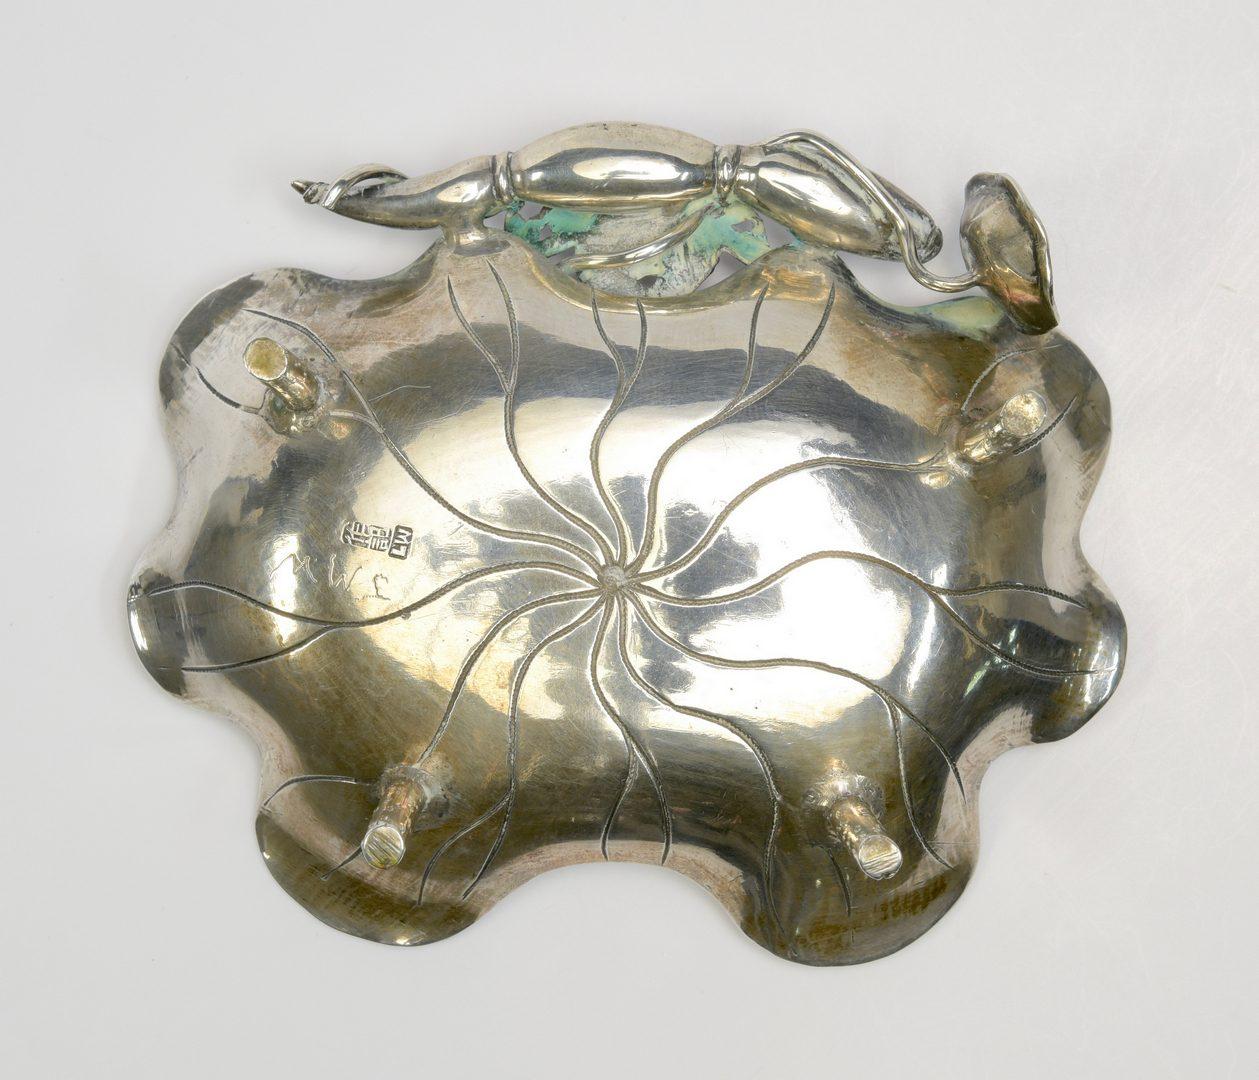 Lot 351: Chinese silver crab dish